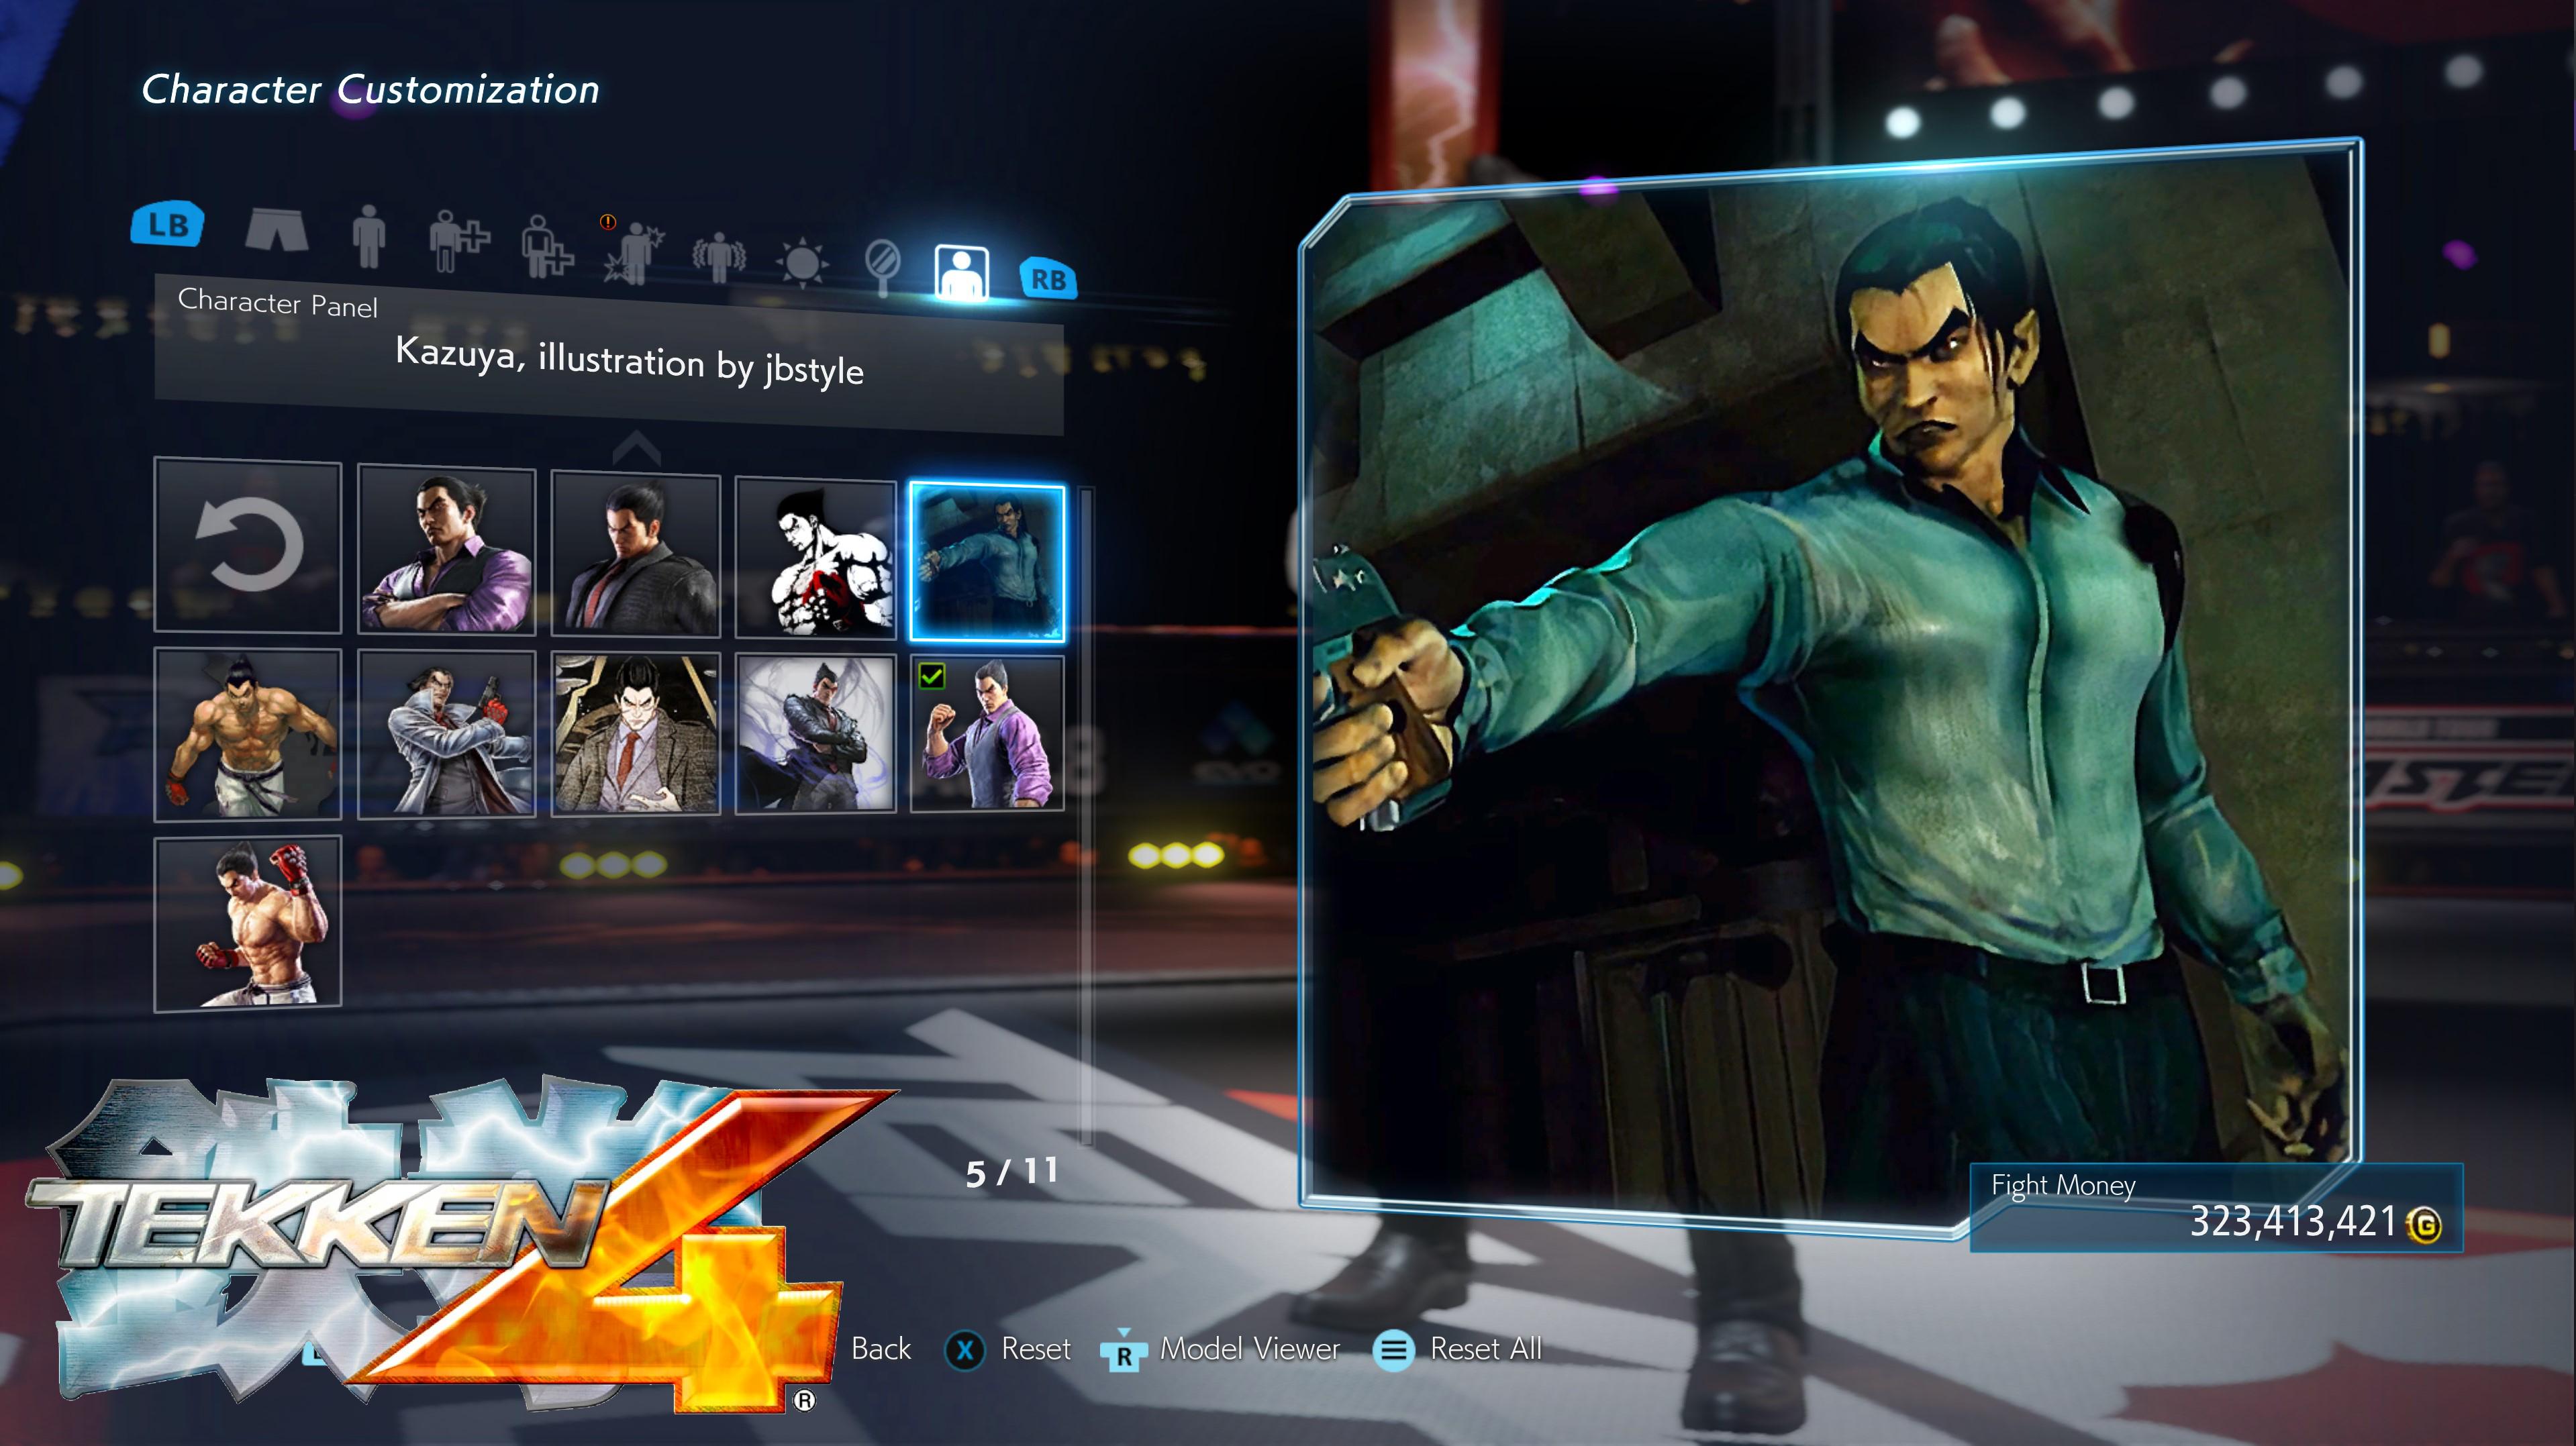 Tekken 4 Kazuya Panel By Thei3arracuda On Deviantart